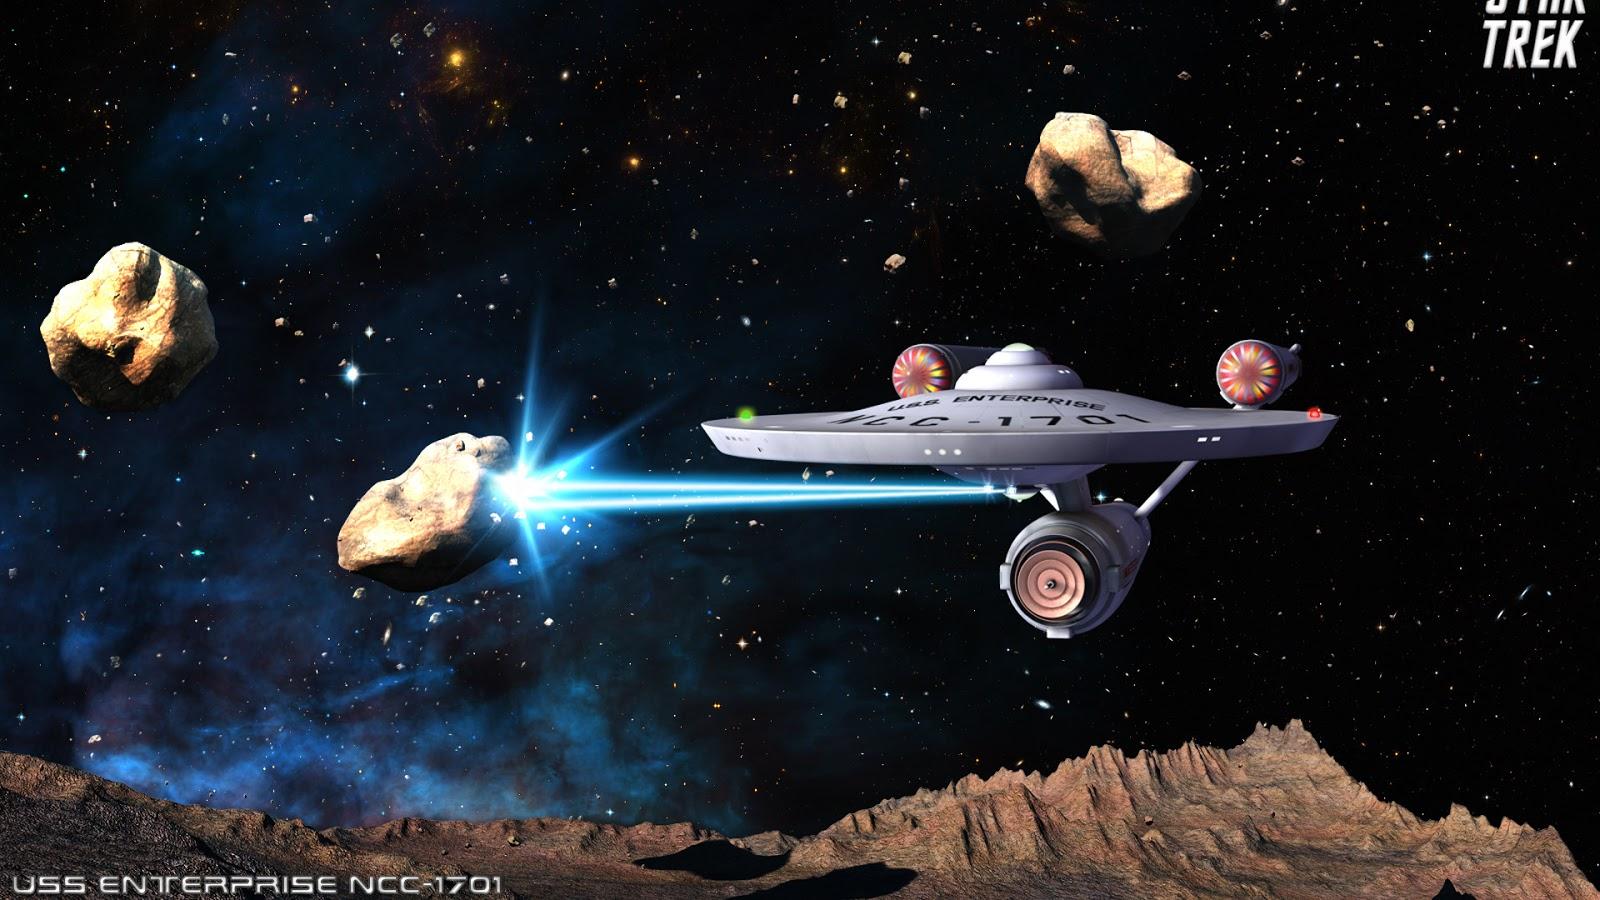 Asteroids 3d Live Wallpaper For Pc Star Trek Sci Fi Blog U S S Enterprise Ncc 1701